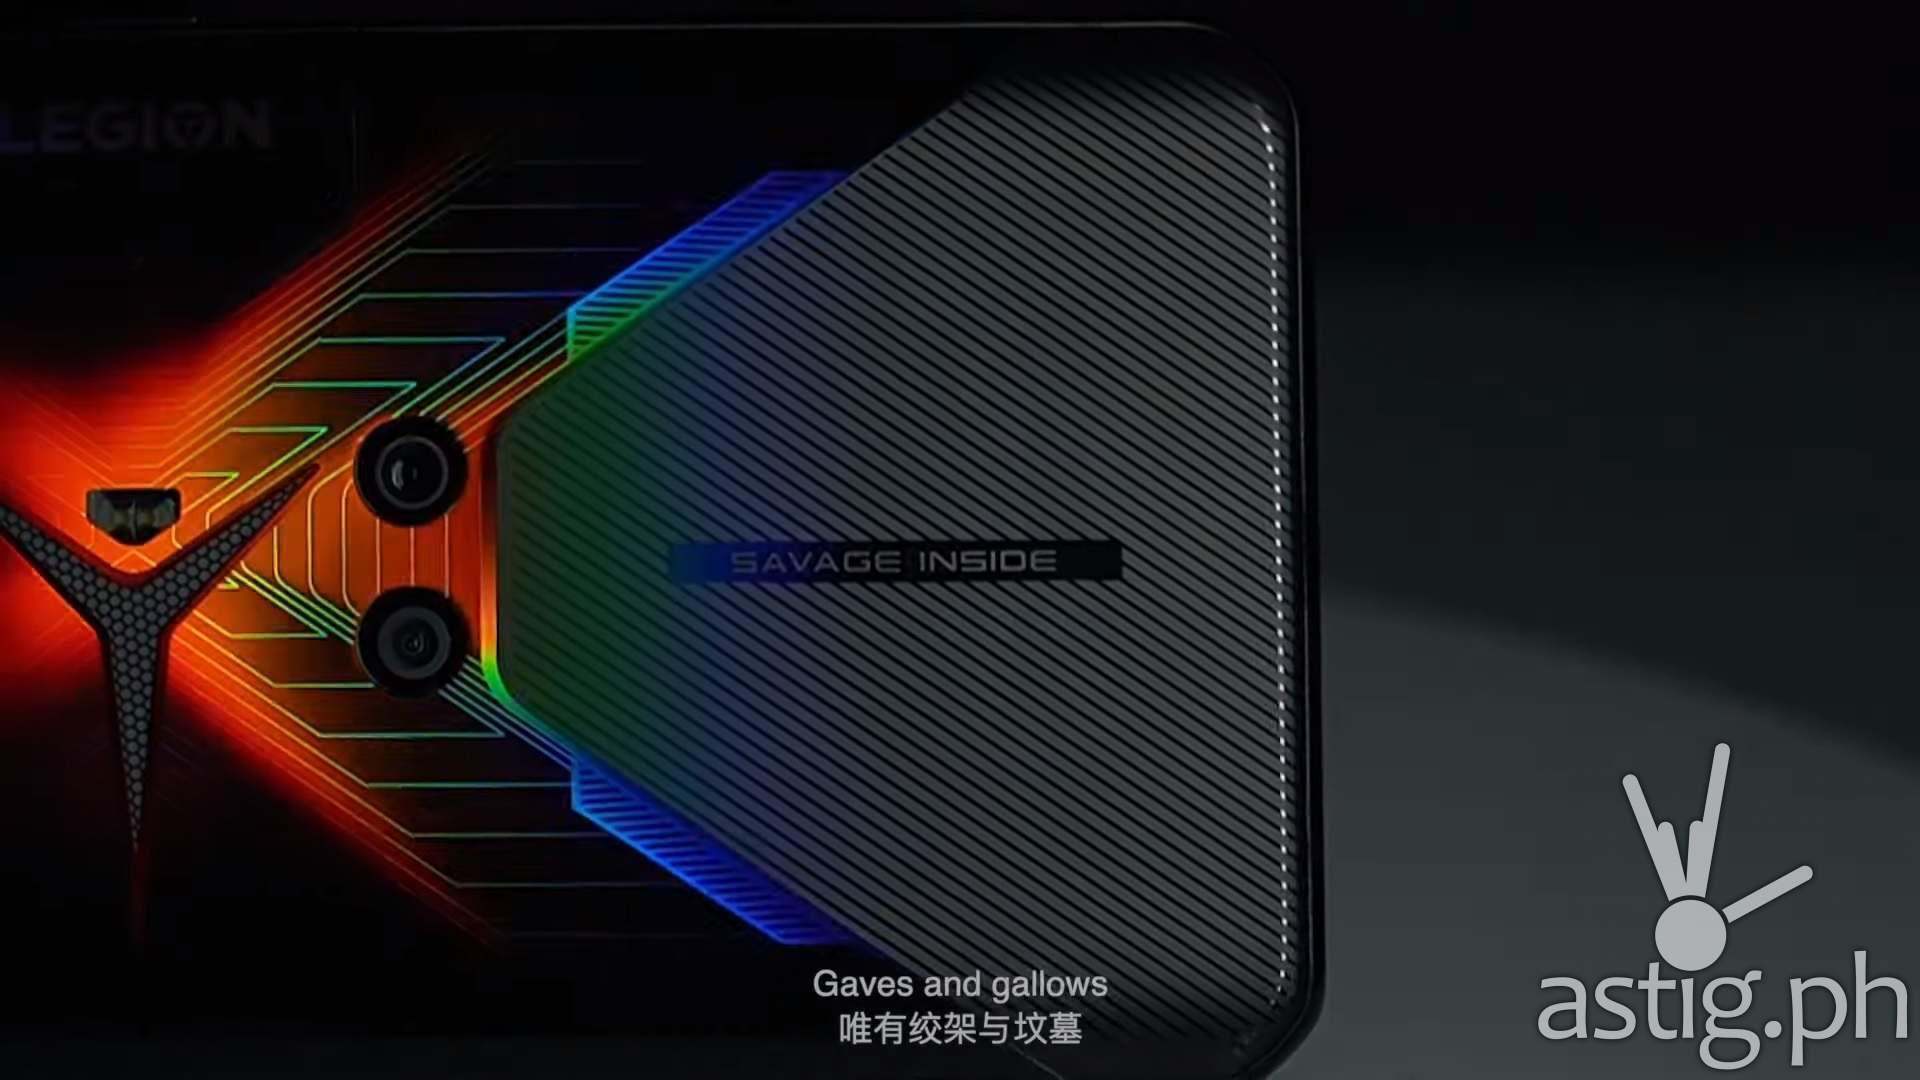 Stylish Outside, Savage Inside - Lenovo Legion Phone Duel gaming smartphone